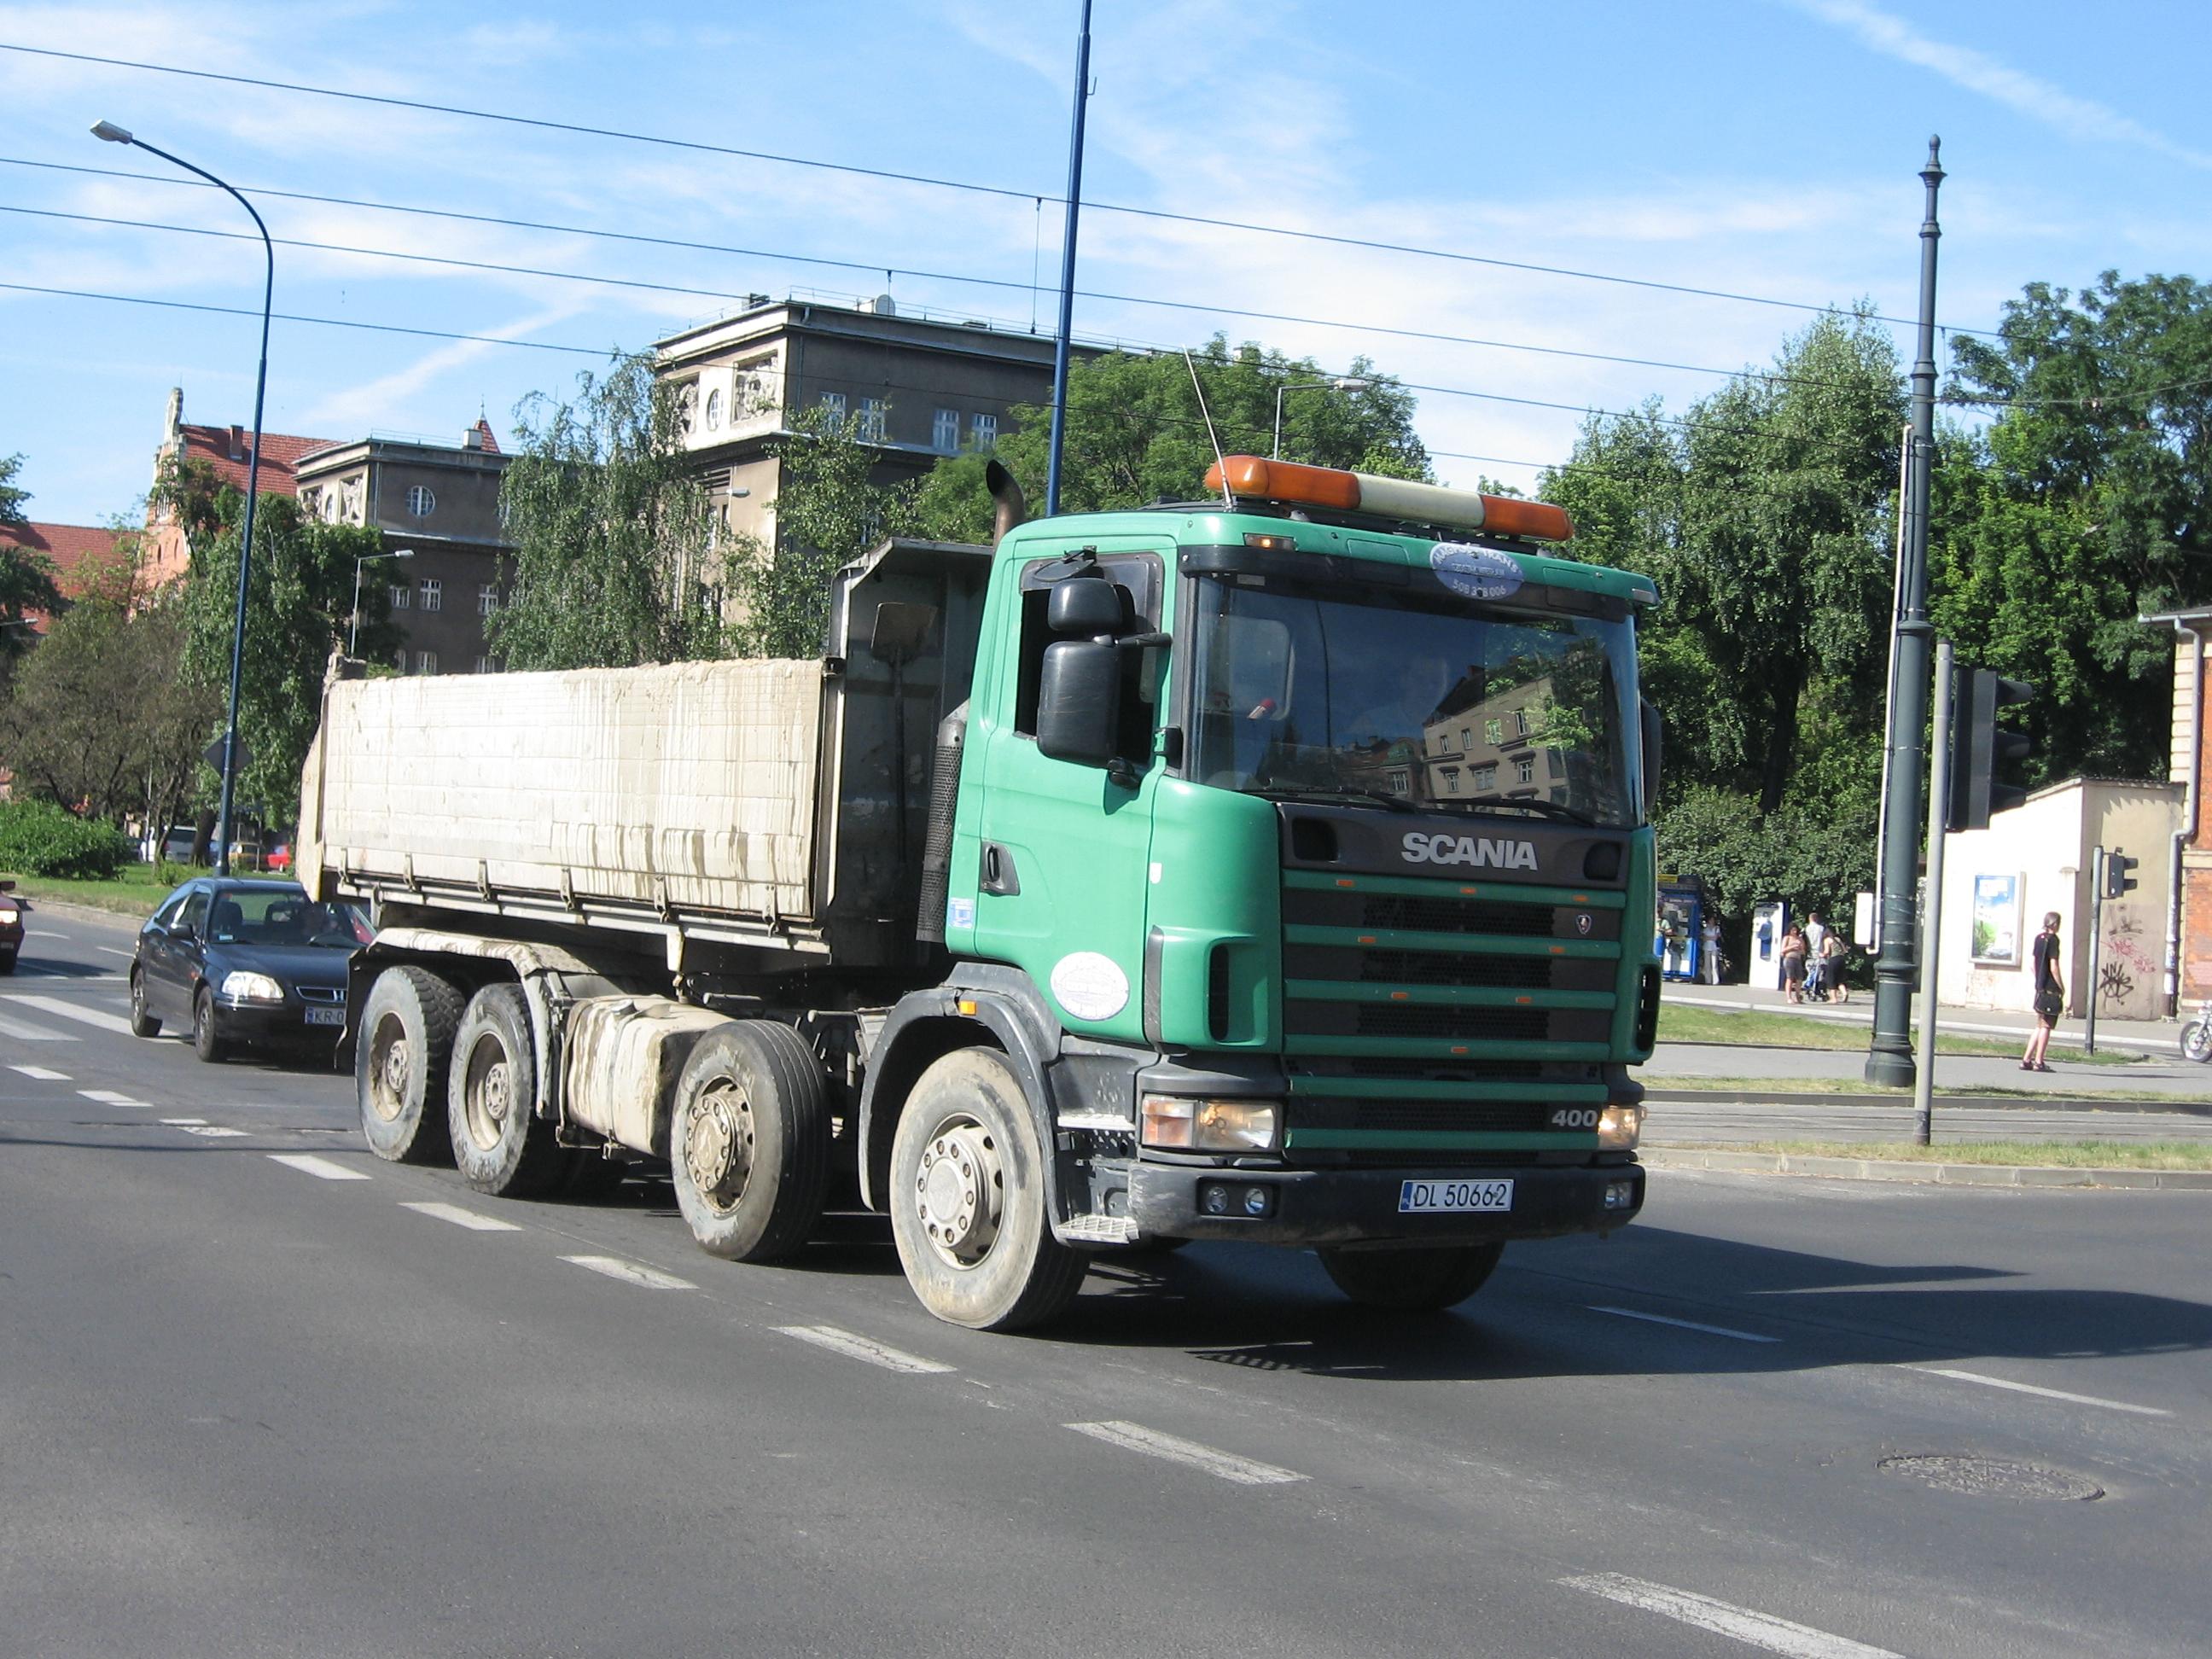 Scania Dump Truck 28 Images Scania 144 Dump Truck